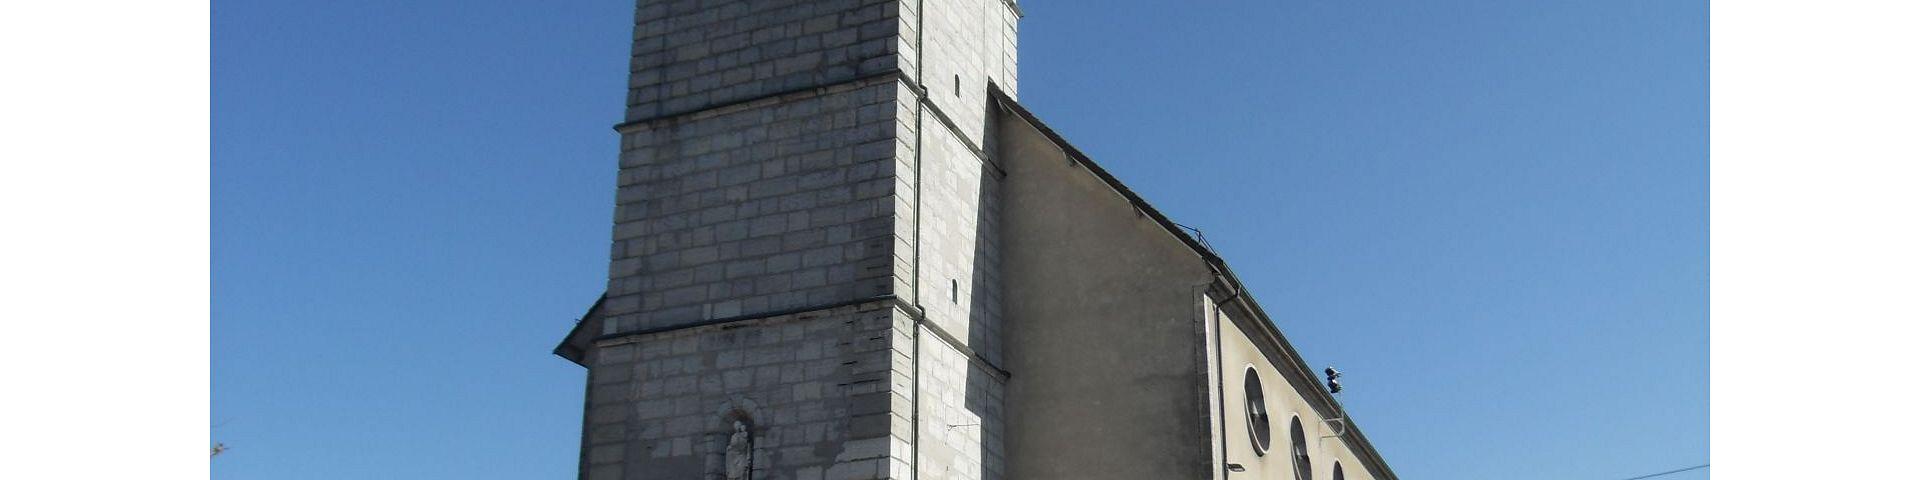 Maîche - Eglise (25)